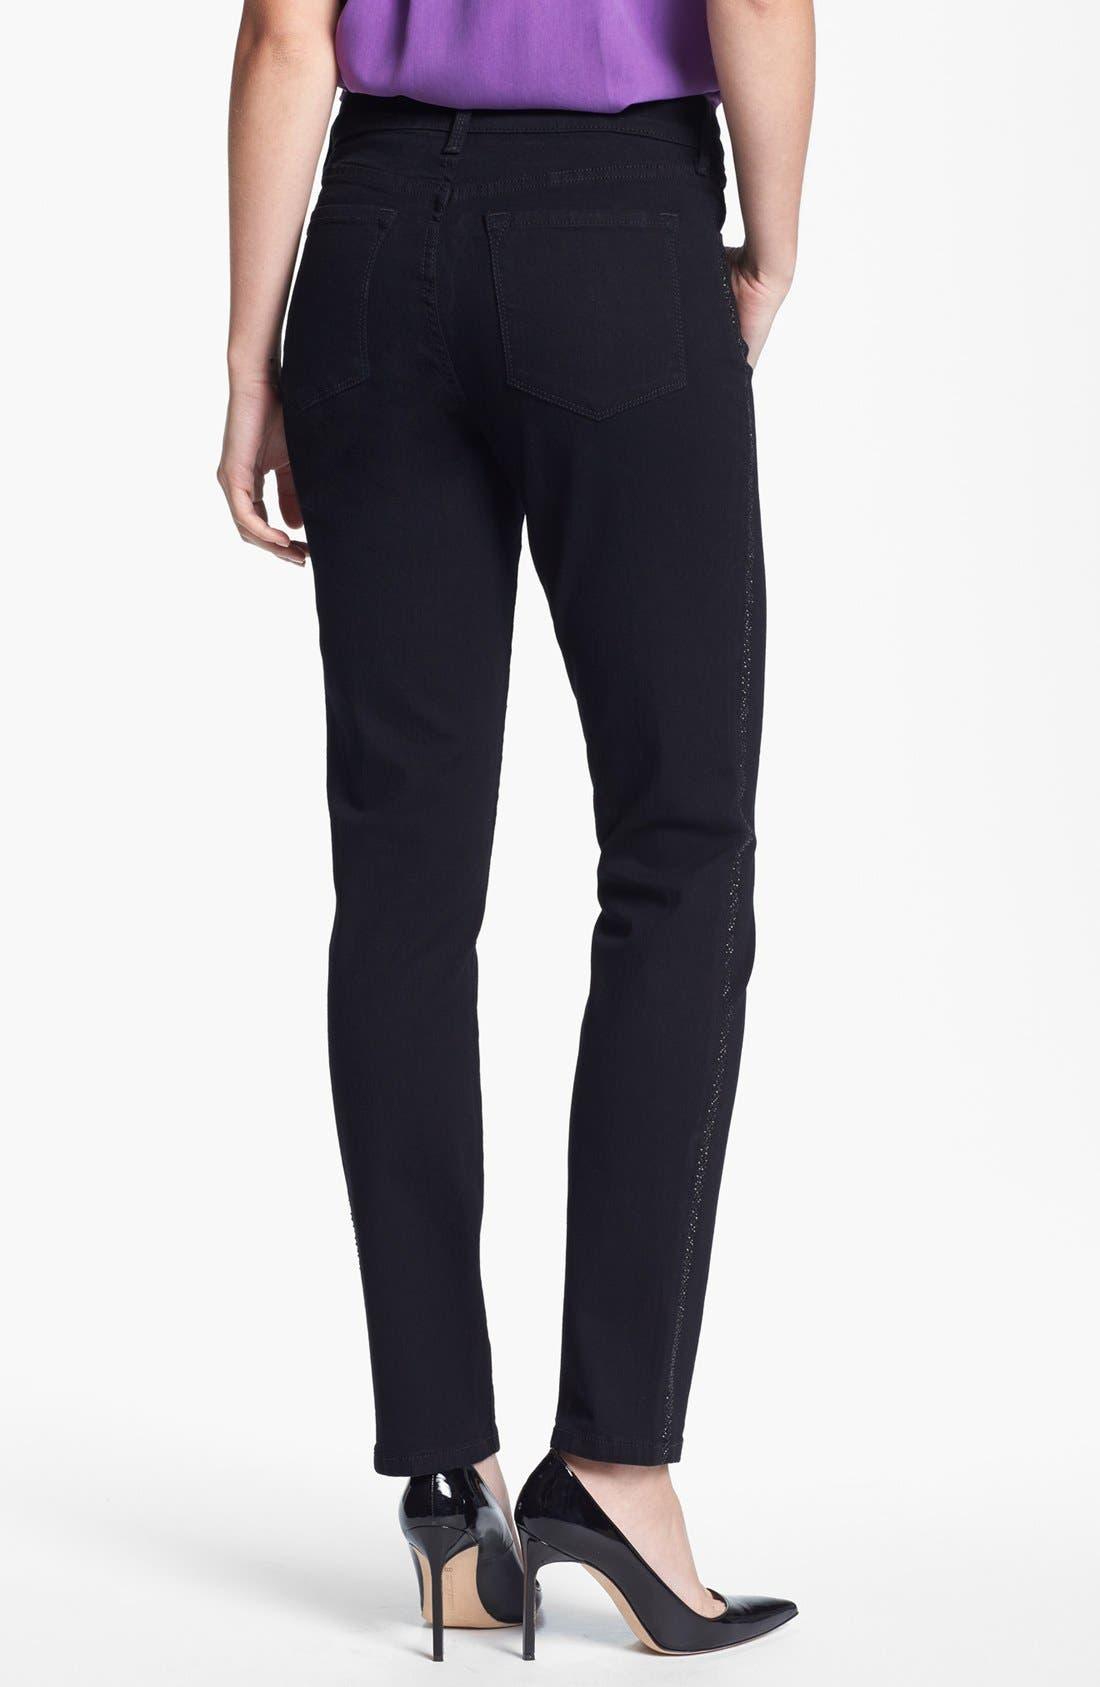 Alternate Image 2  - NYDJ 'Alina' Embellished Trim Stretch Skinny Jeans (Black)